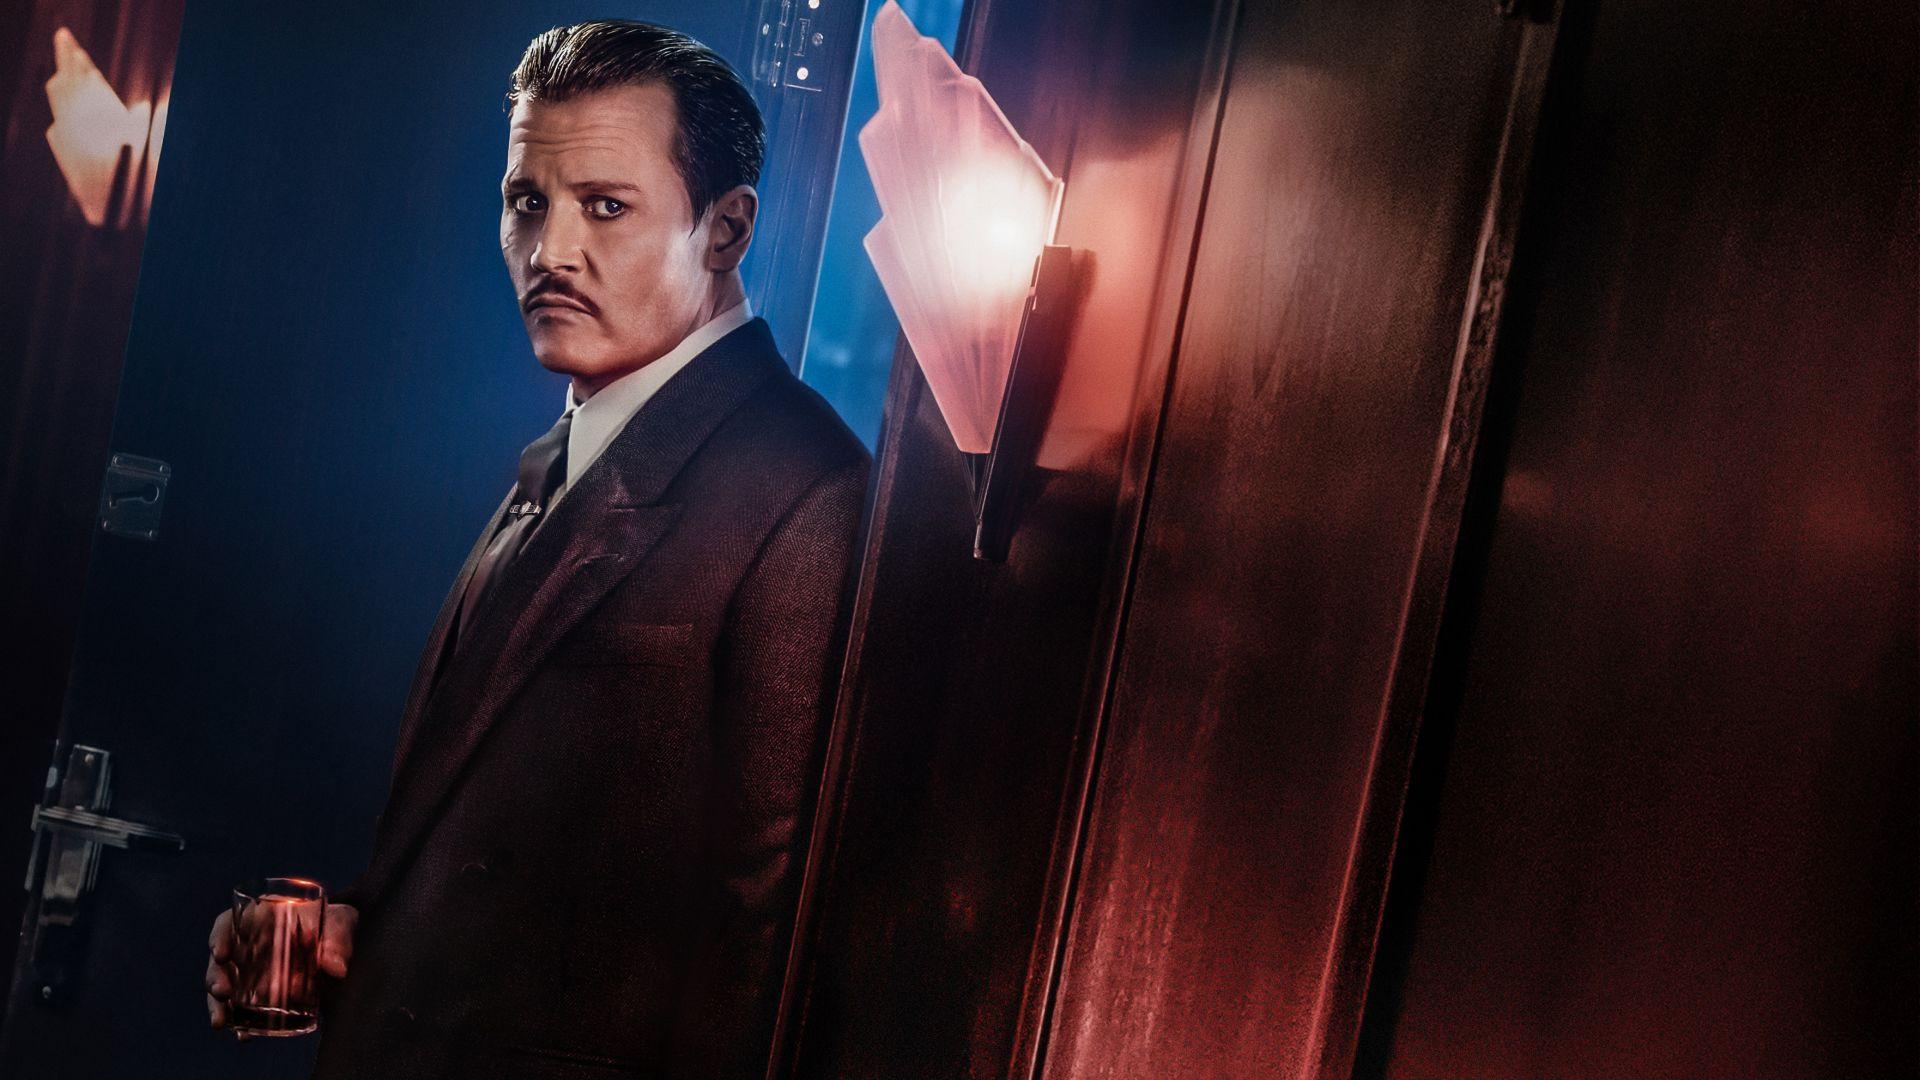 Wallpaper Johnny Depp, Ratchett, Murder on the orient express, 2017 movie